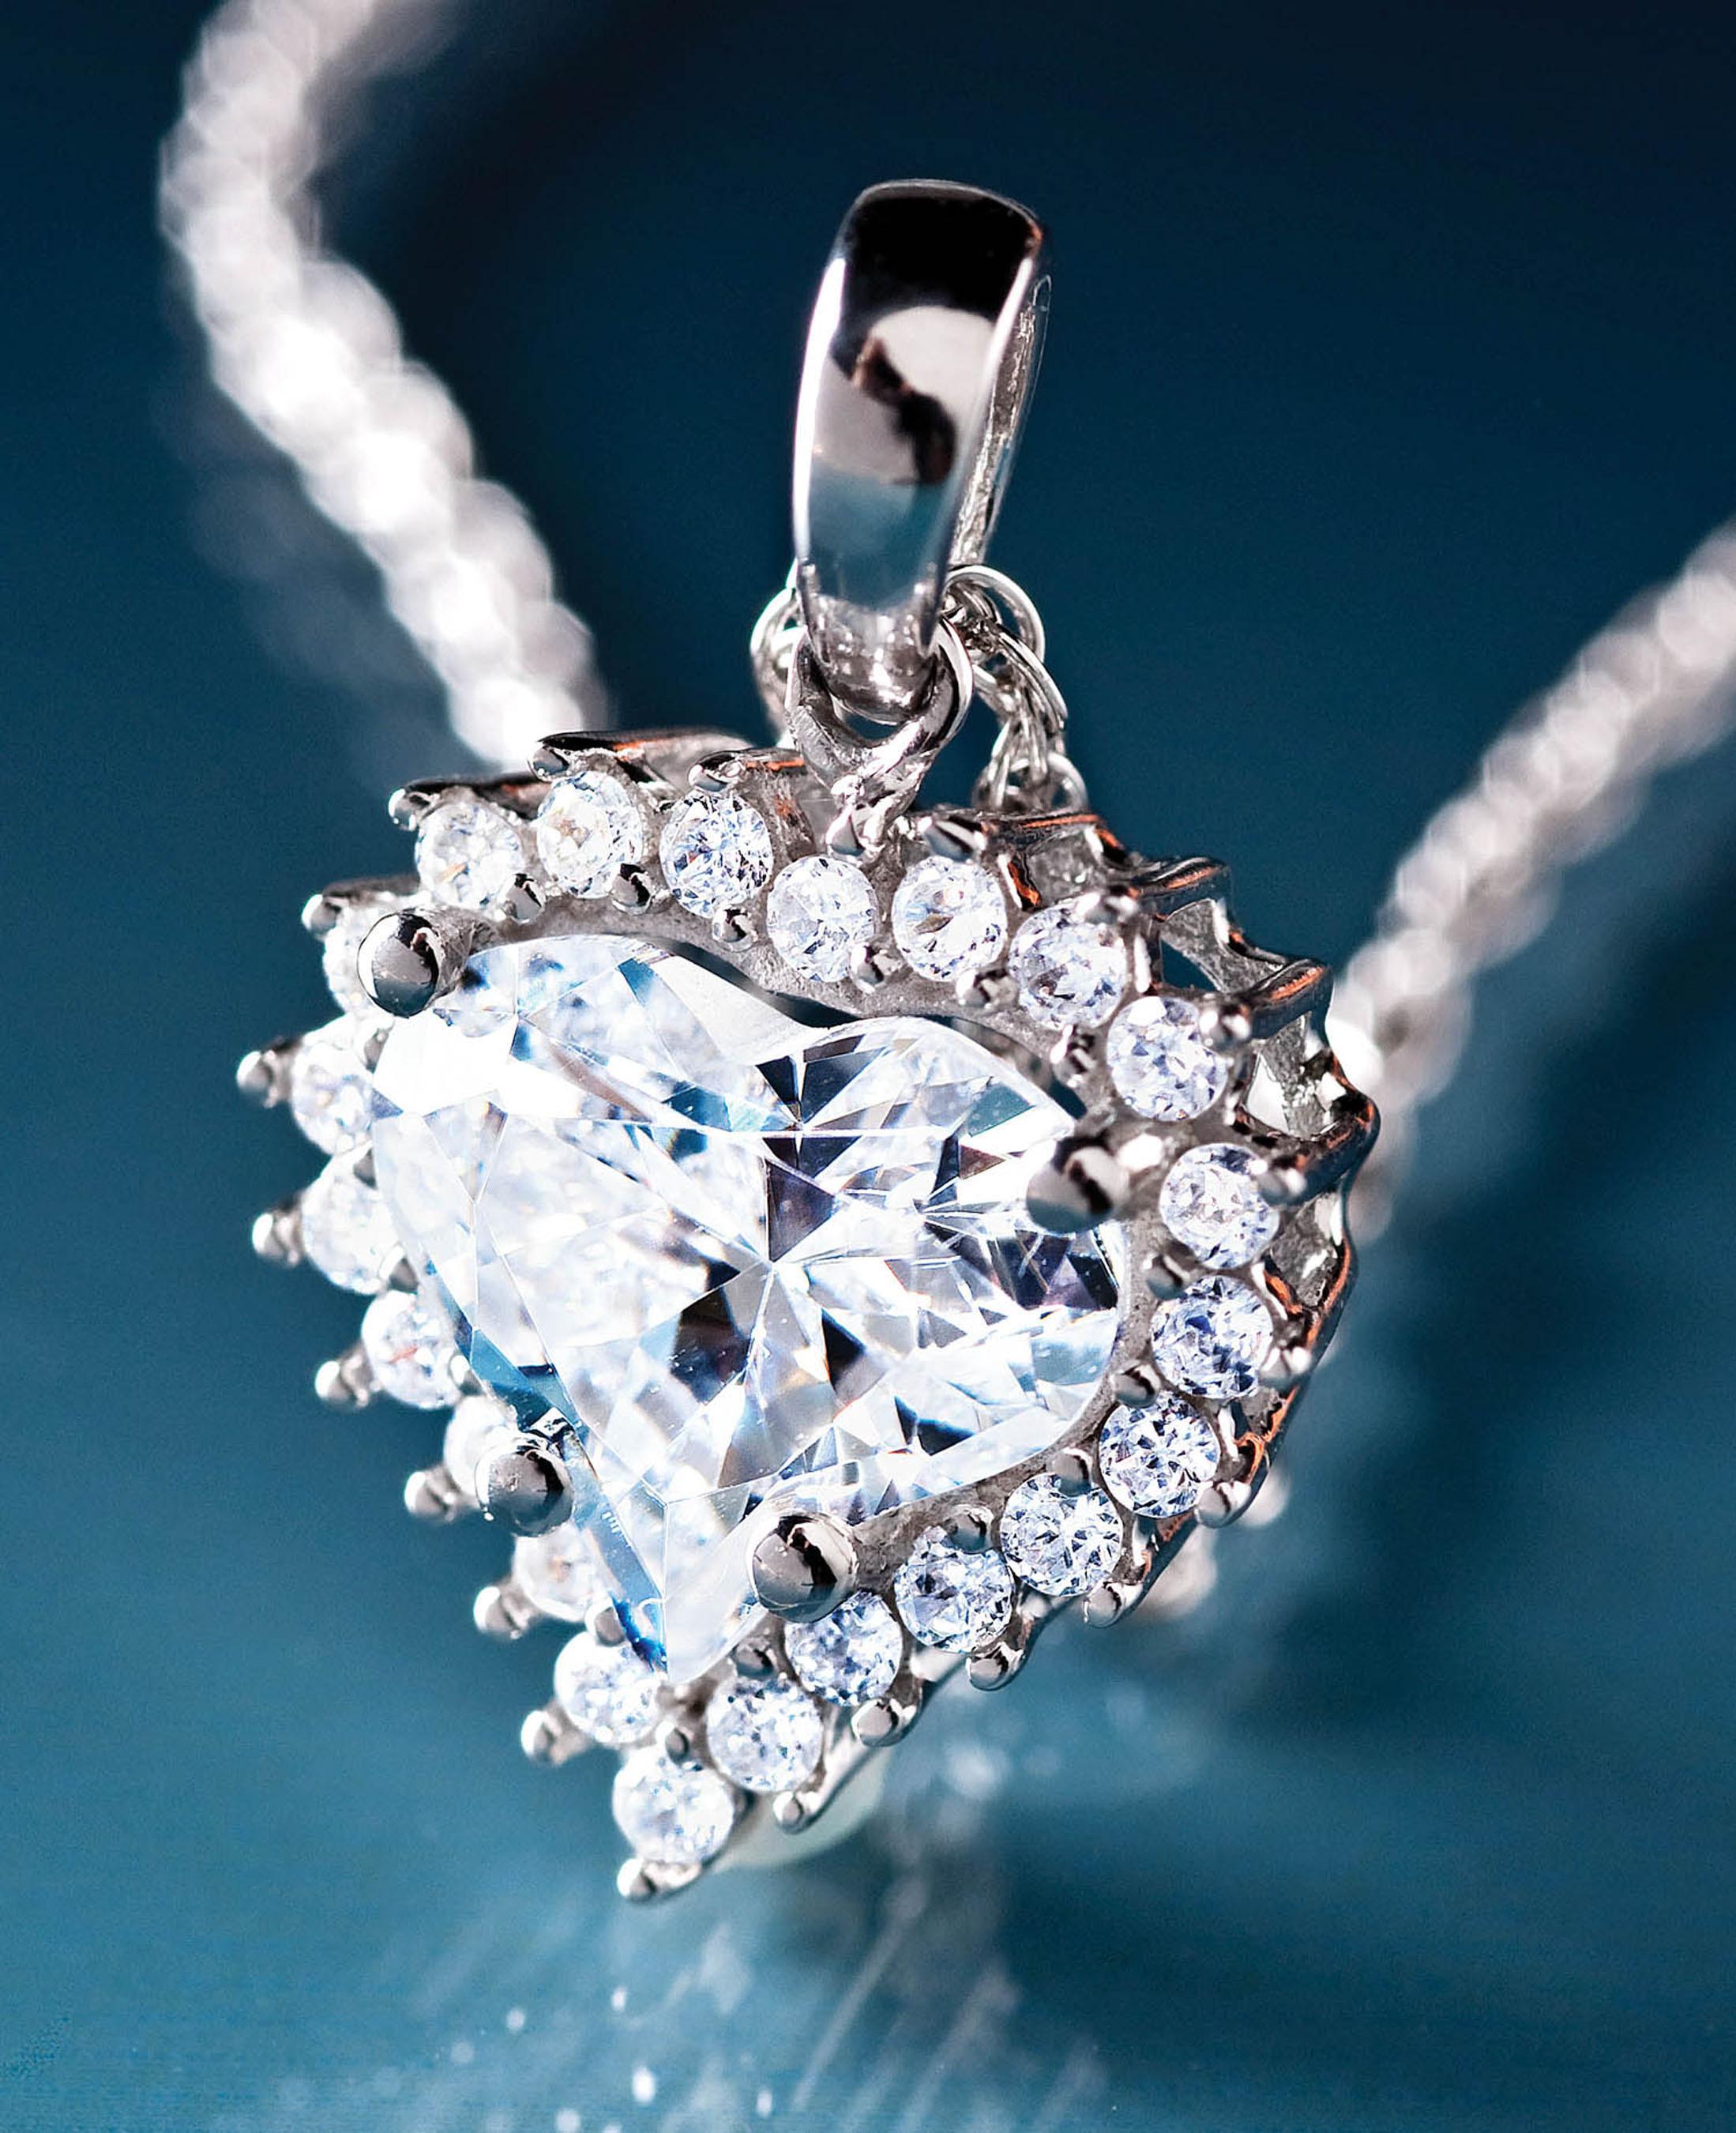 DiamondAura True Heart Necklace, $14, available at www.stauer.com/valentinesday. (PRNewsFoto/Stauer) (PRNewsFoto/STAUER)